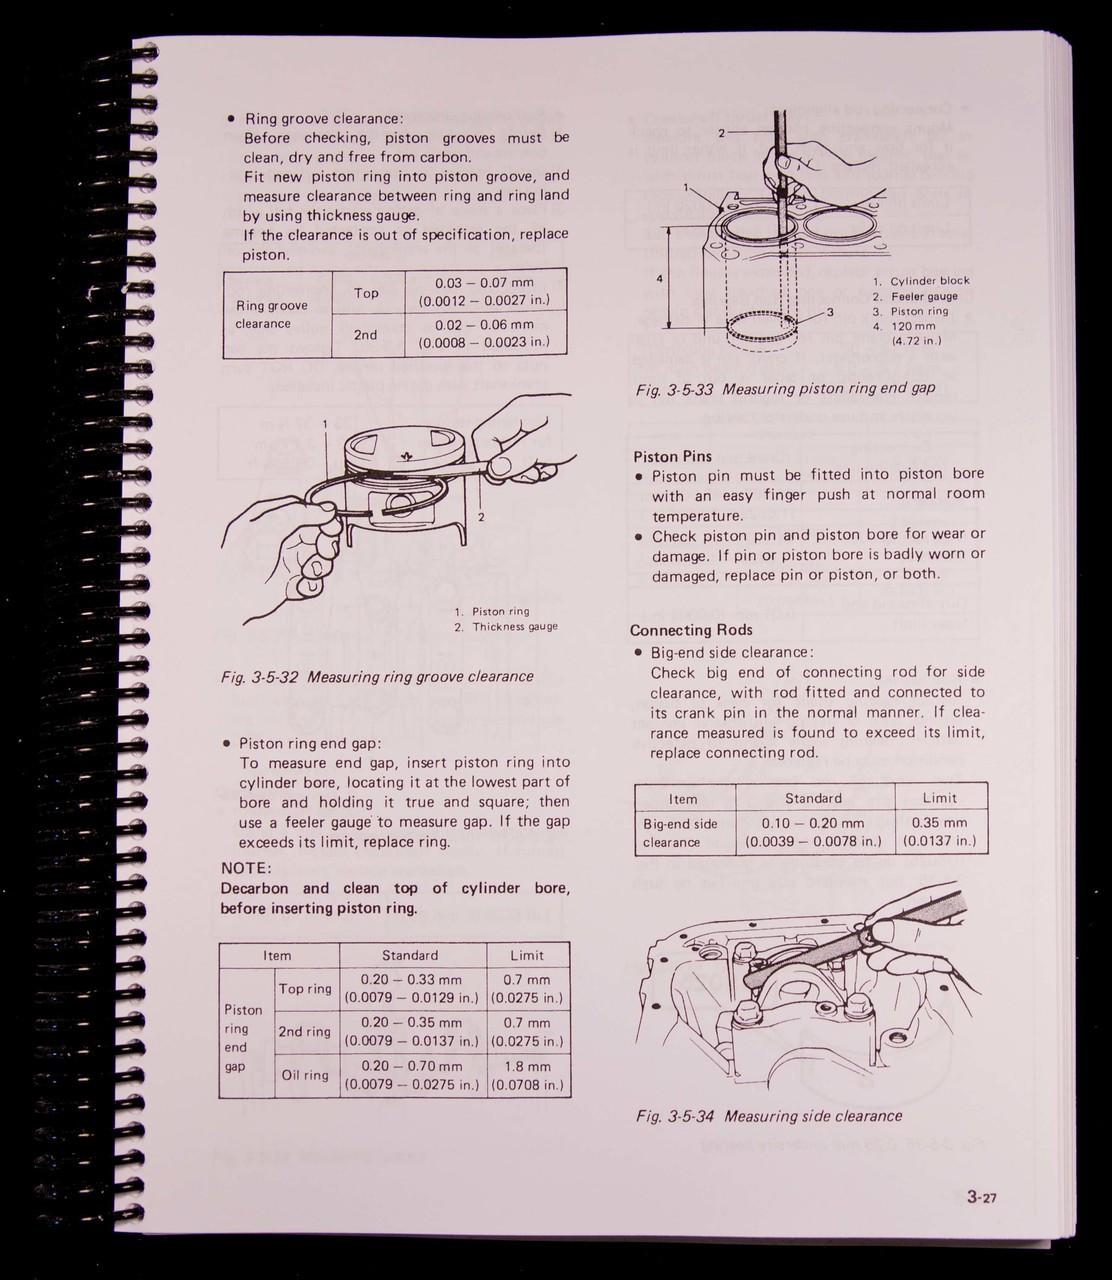 Suzuki Samurai Factory Service Manual - 1986-1988. Price: $65.00. Image 1.  Larger / More Photos